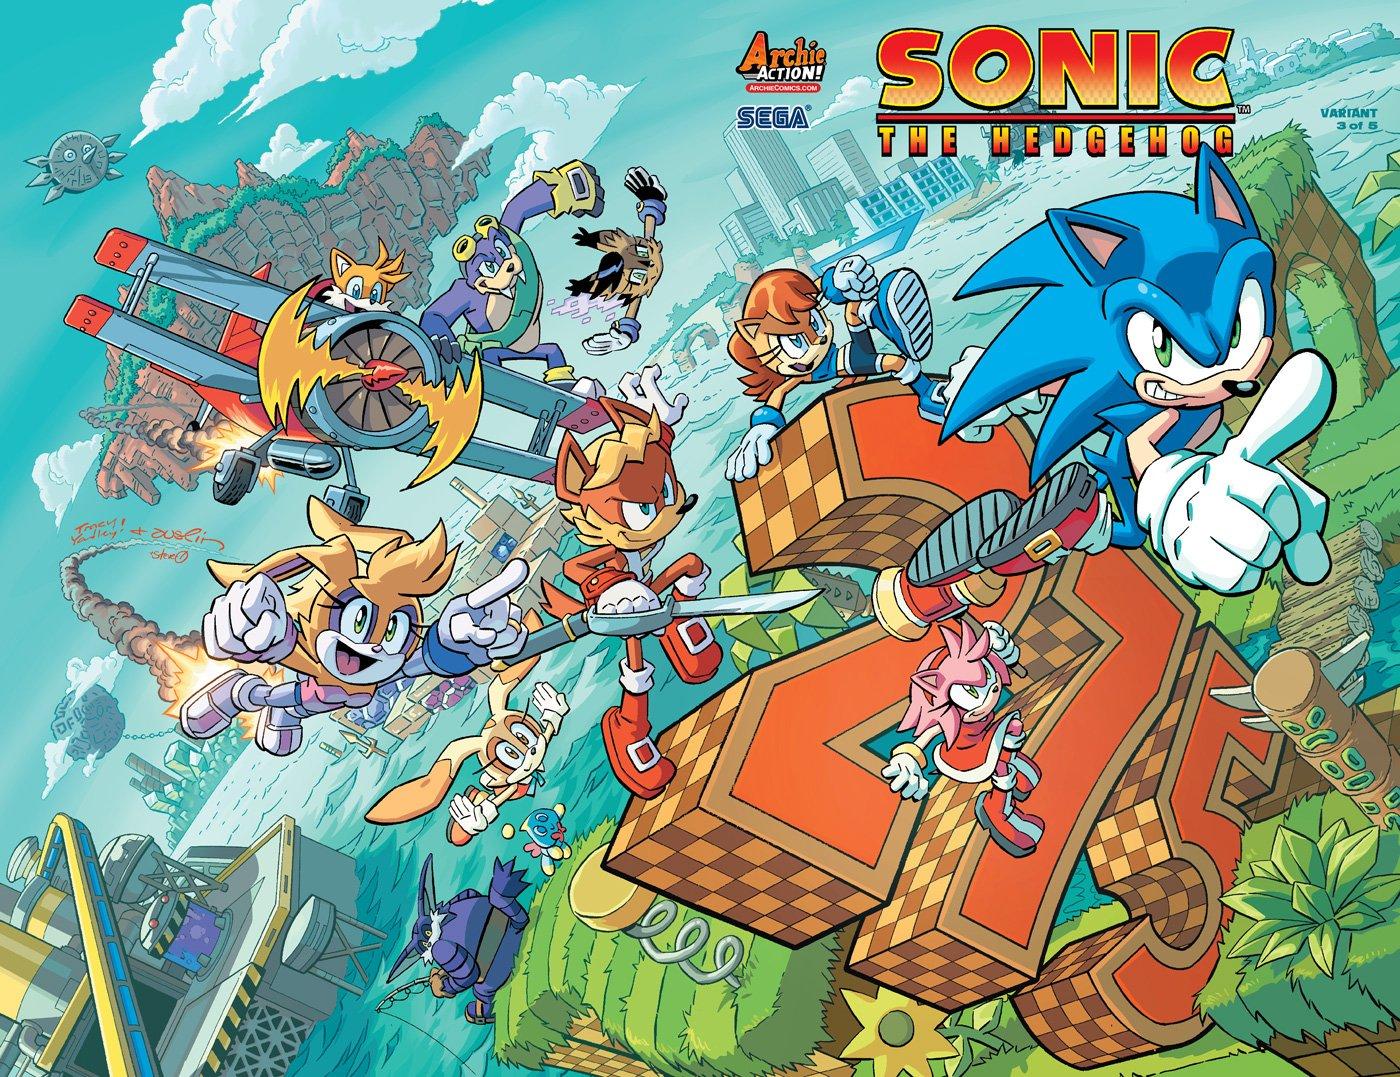 Sonic the Hedgehog 275 (October 2015) (variant 3)